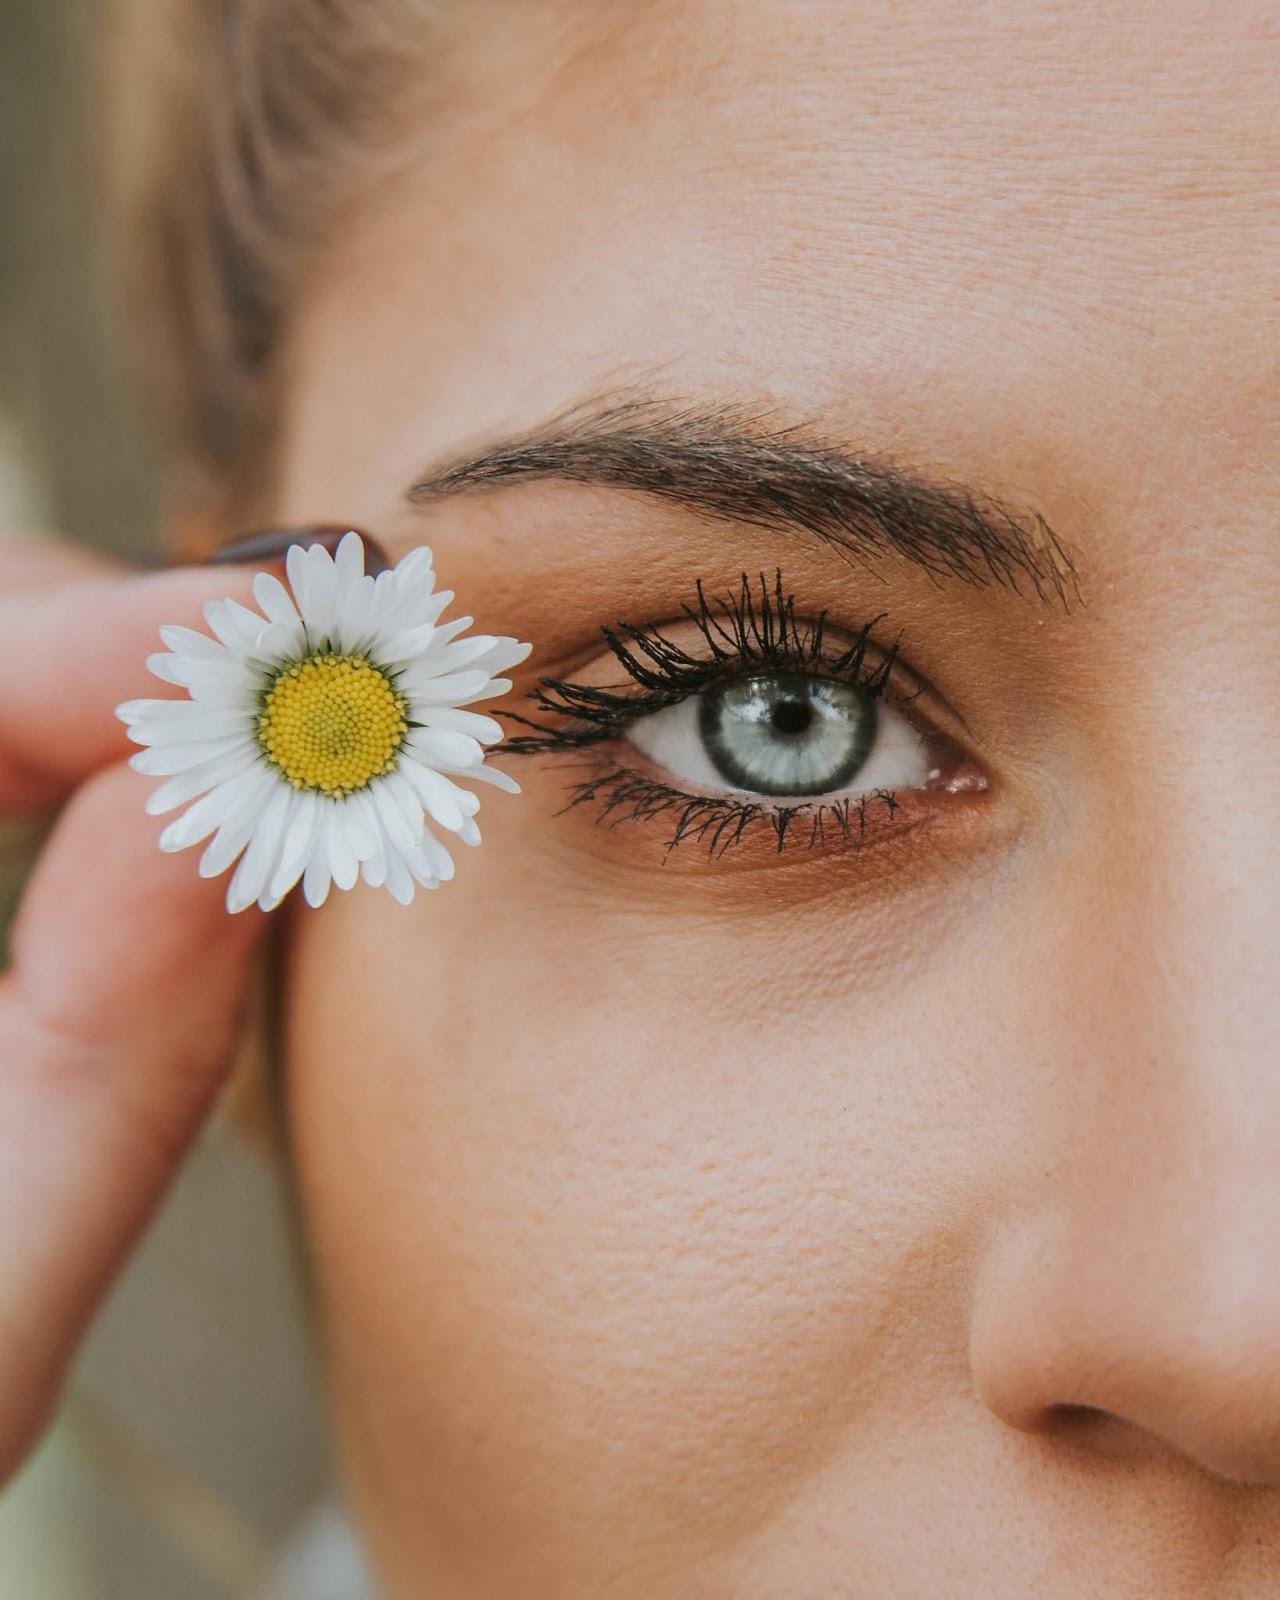 Kohathite: Eyebrow Regrowth | Growing Your Eyebrows Back